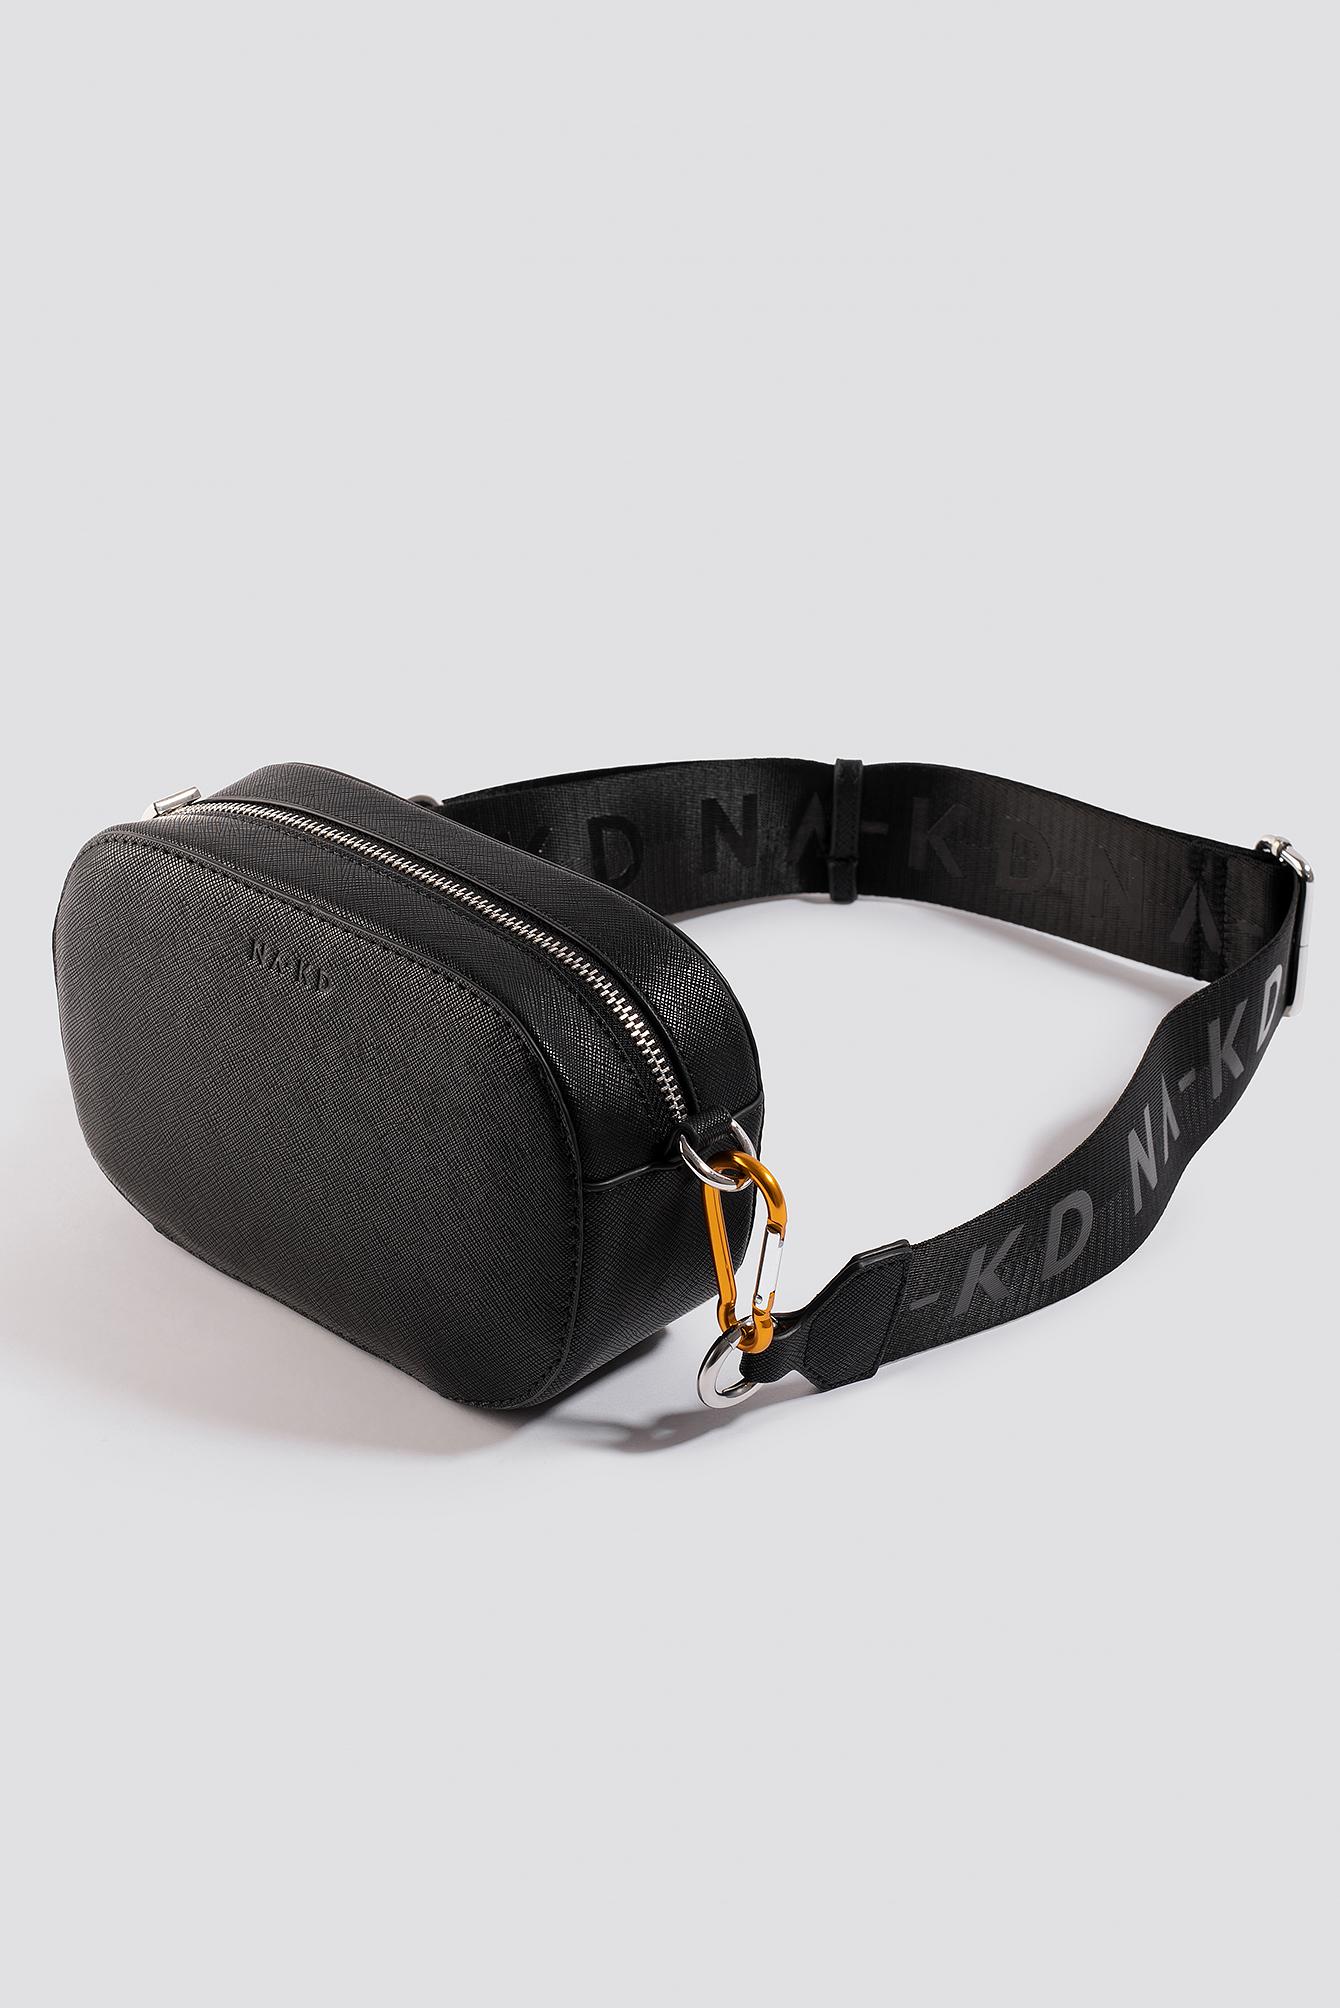 Industrial Hooks Oval Bag NA-KD.COM